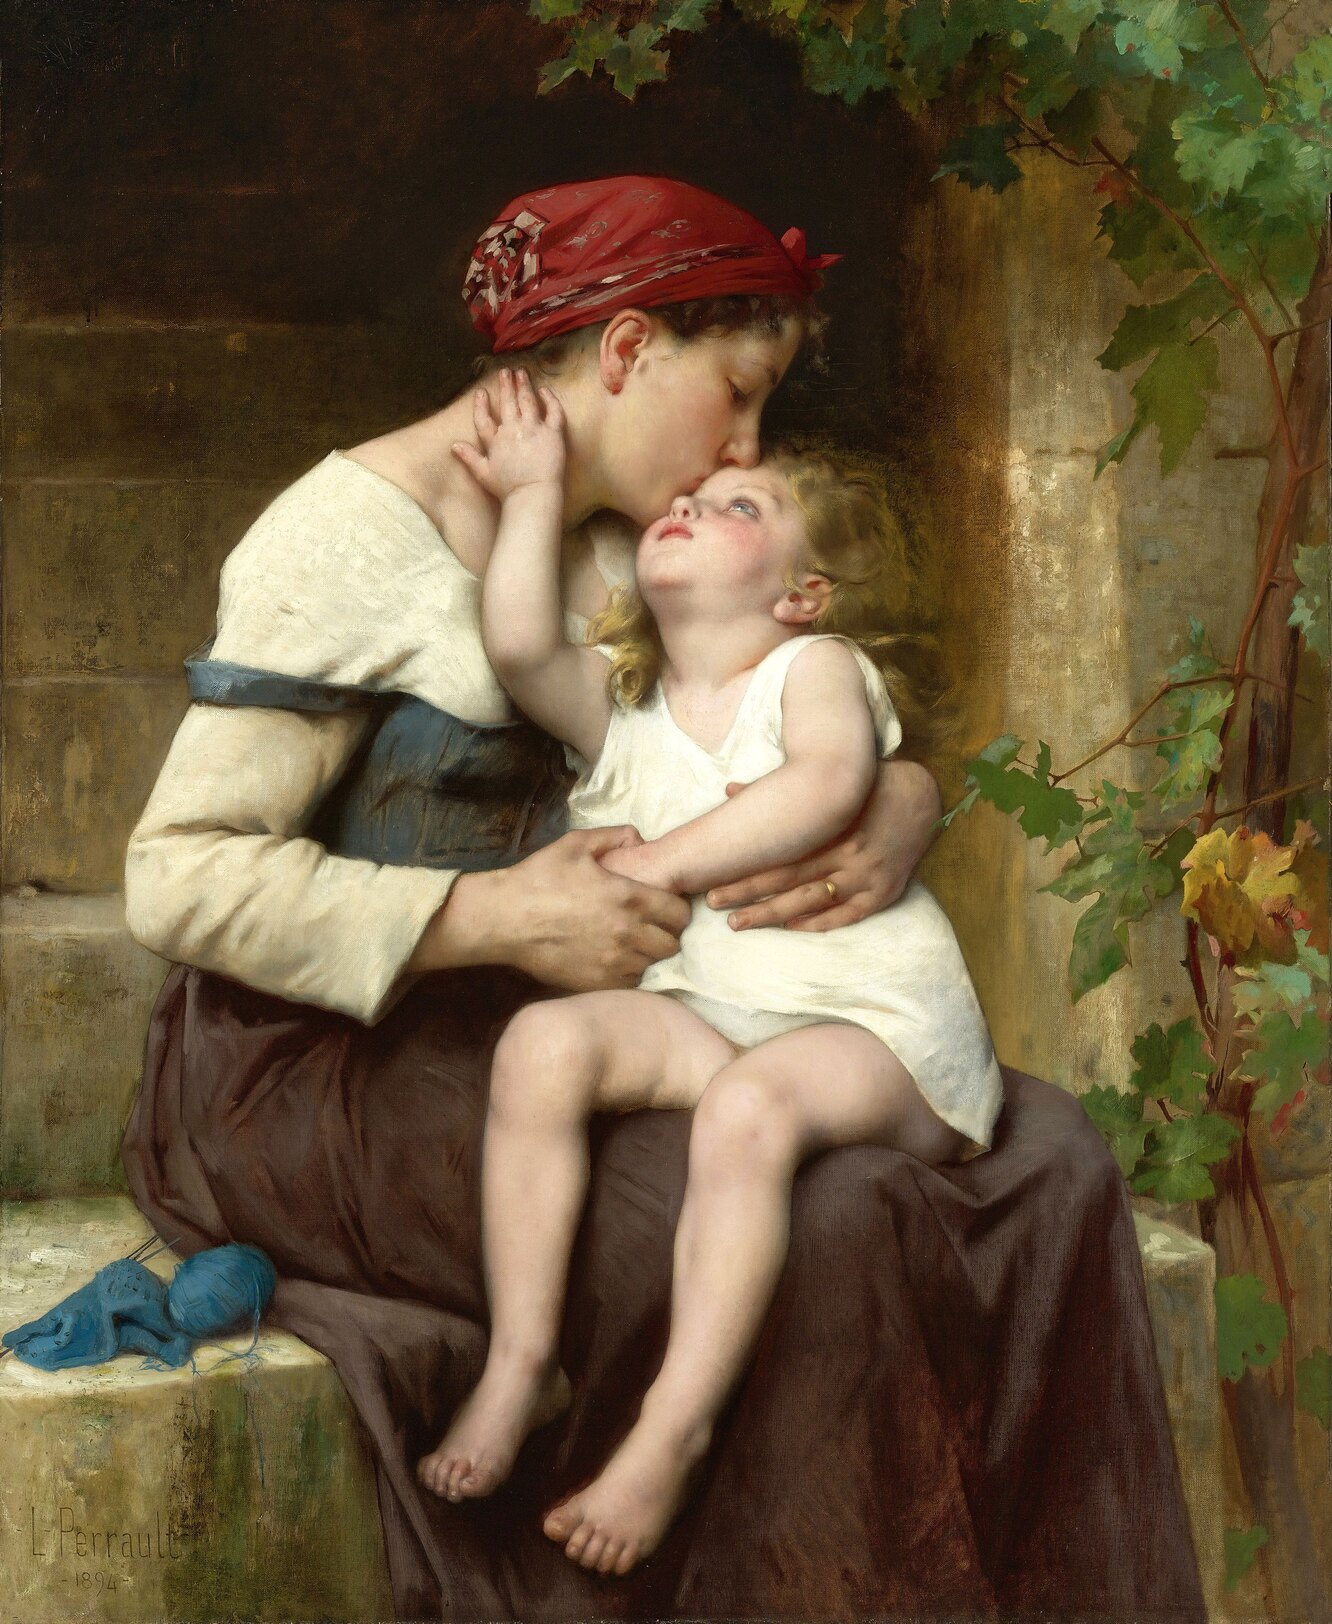 Леон-Жан-Базиль Перро, «Мать с ребенком», 1894